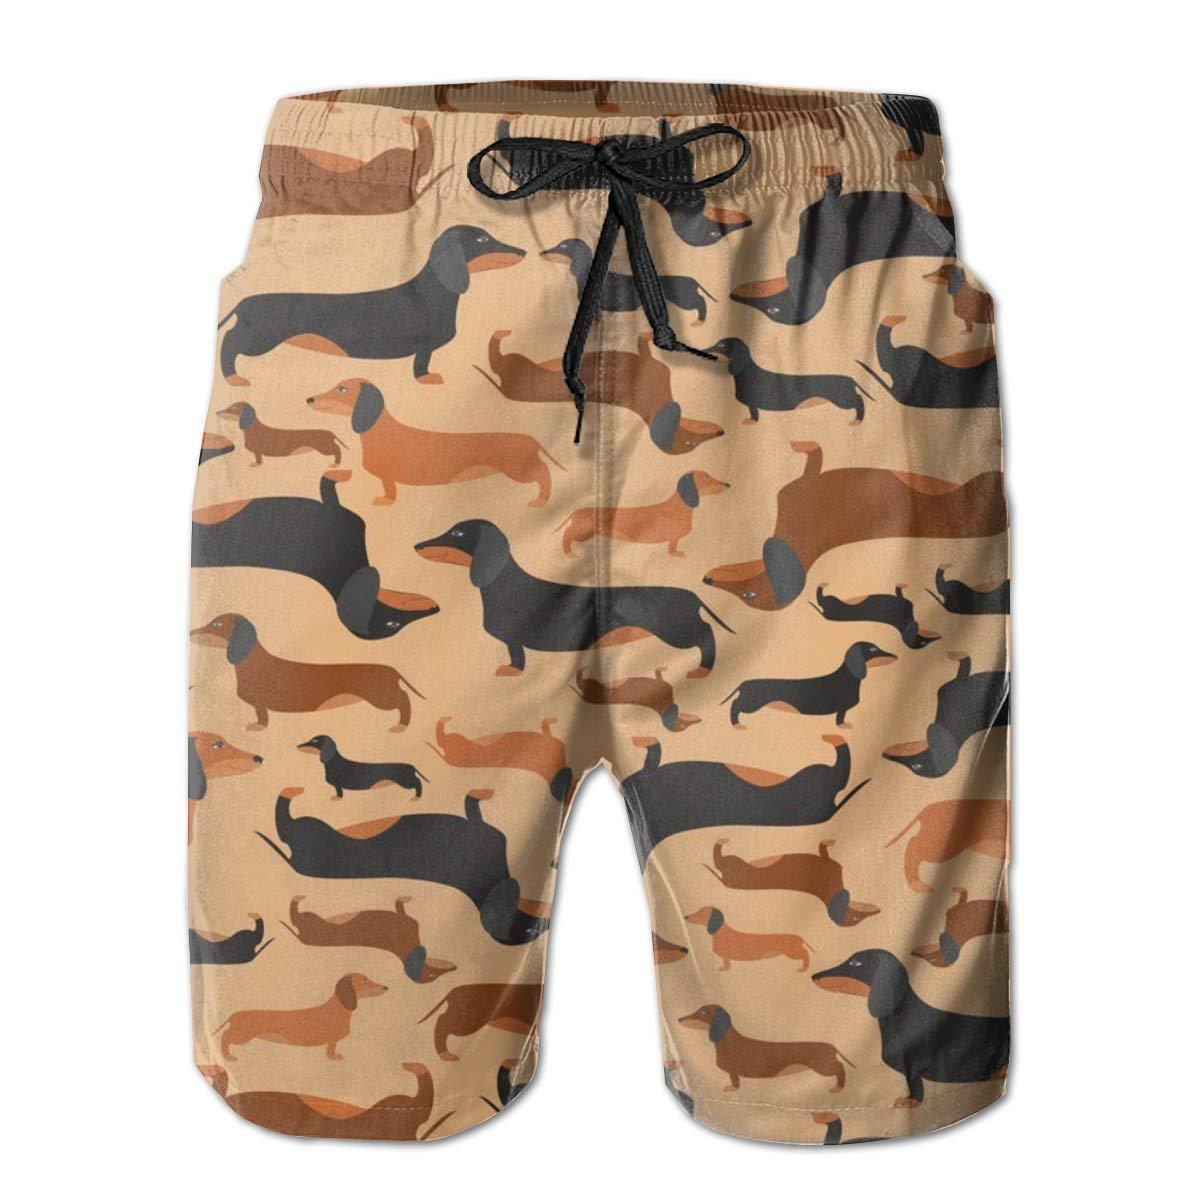 P-AKAS Mens Summer Quick Dry Beach Shorts - Retro Dachshunds Swim Surfing Trunks - Elastic Waist Drawstring Board Shorts